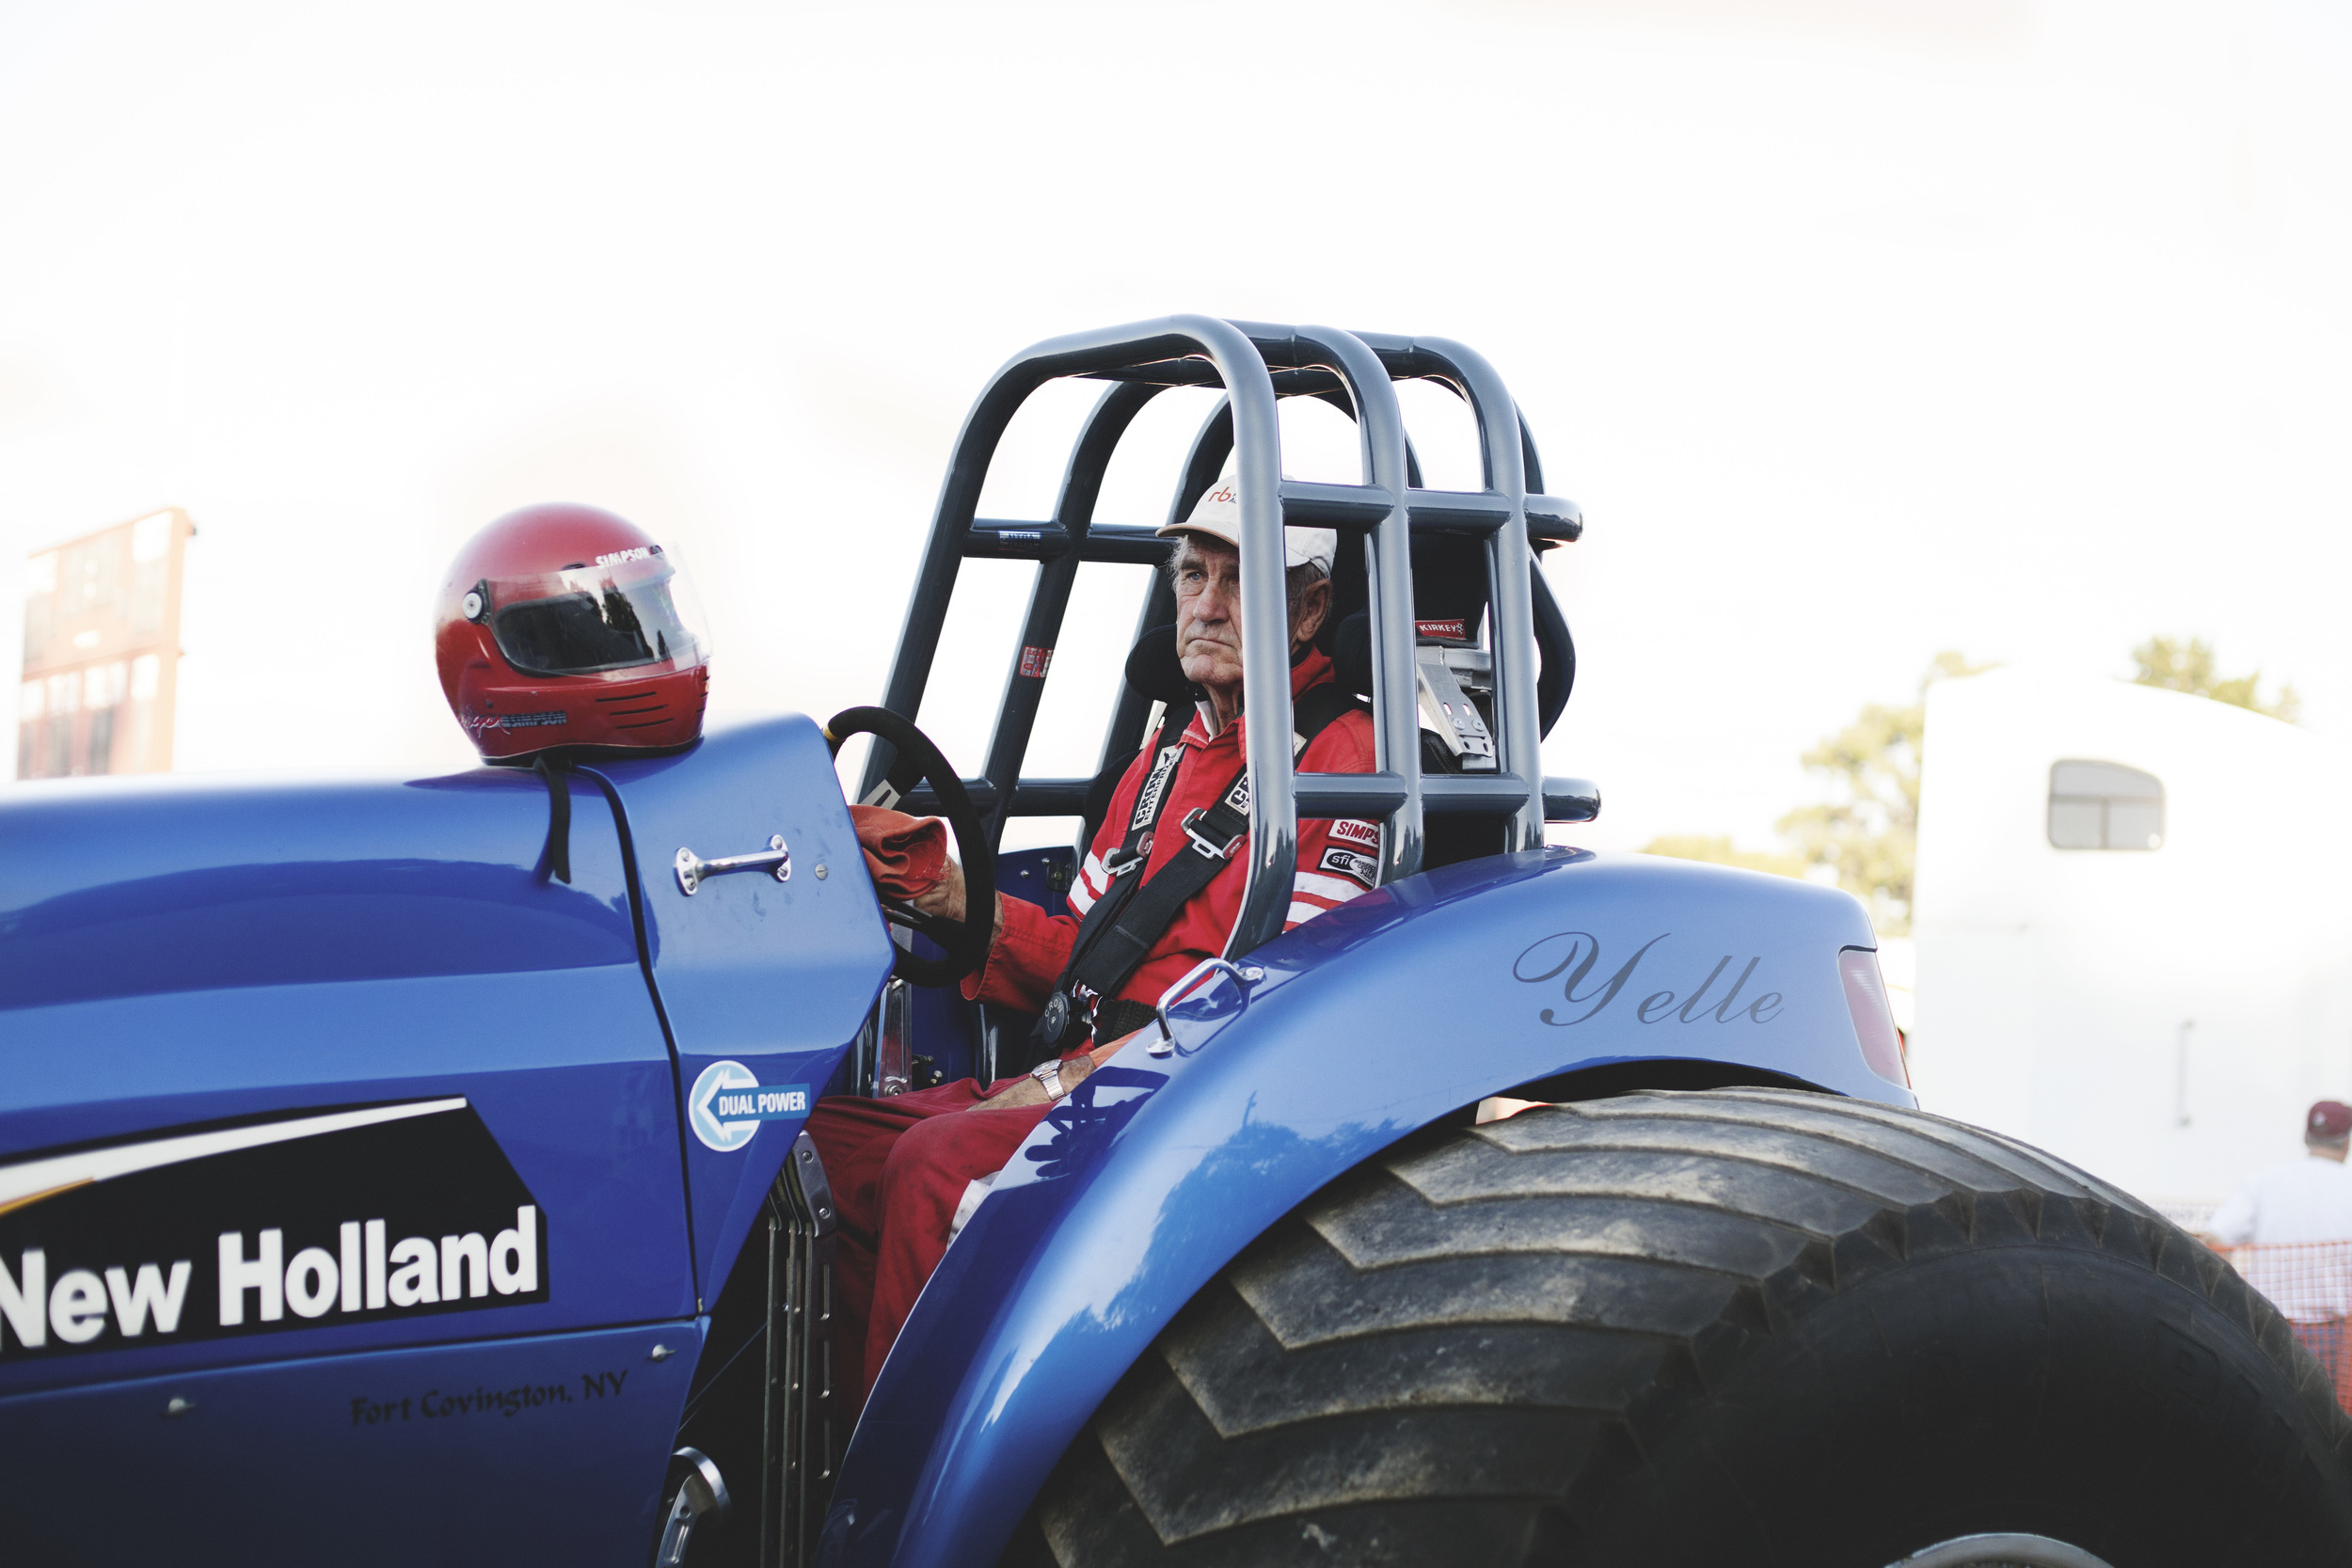 Tractor_Pull_6.jpg